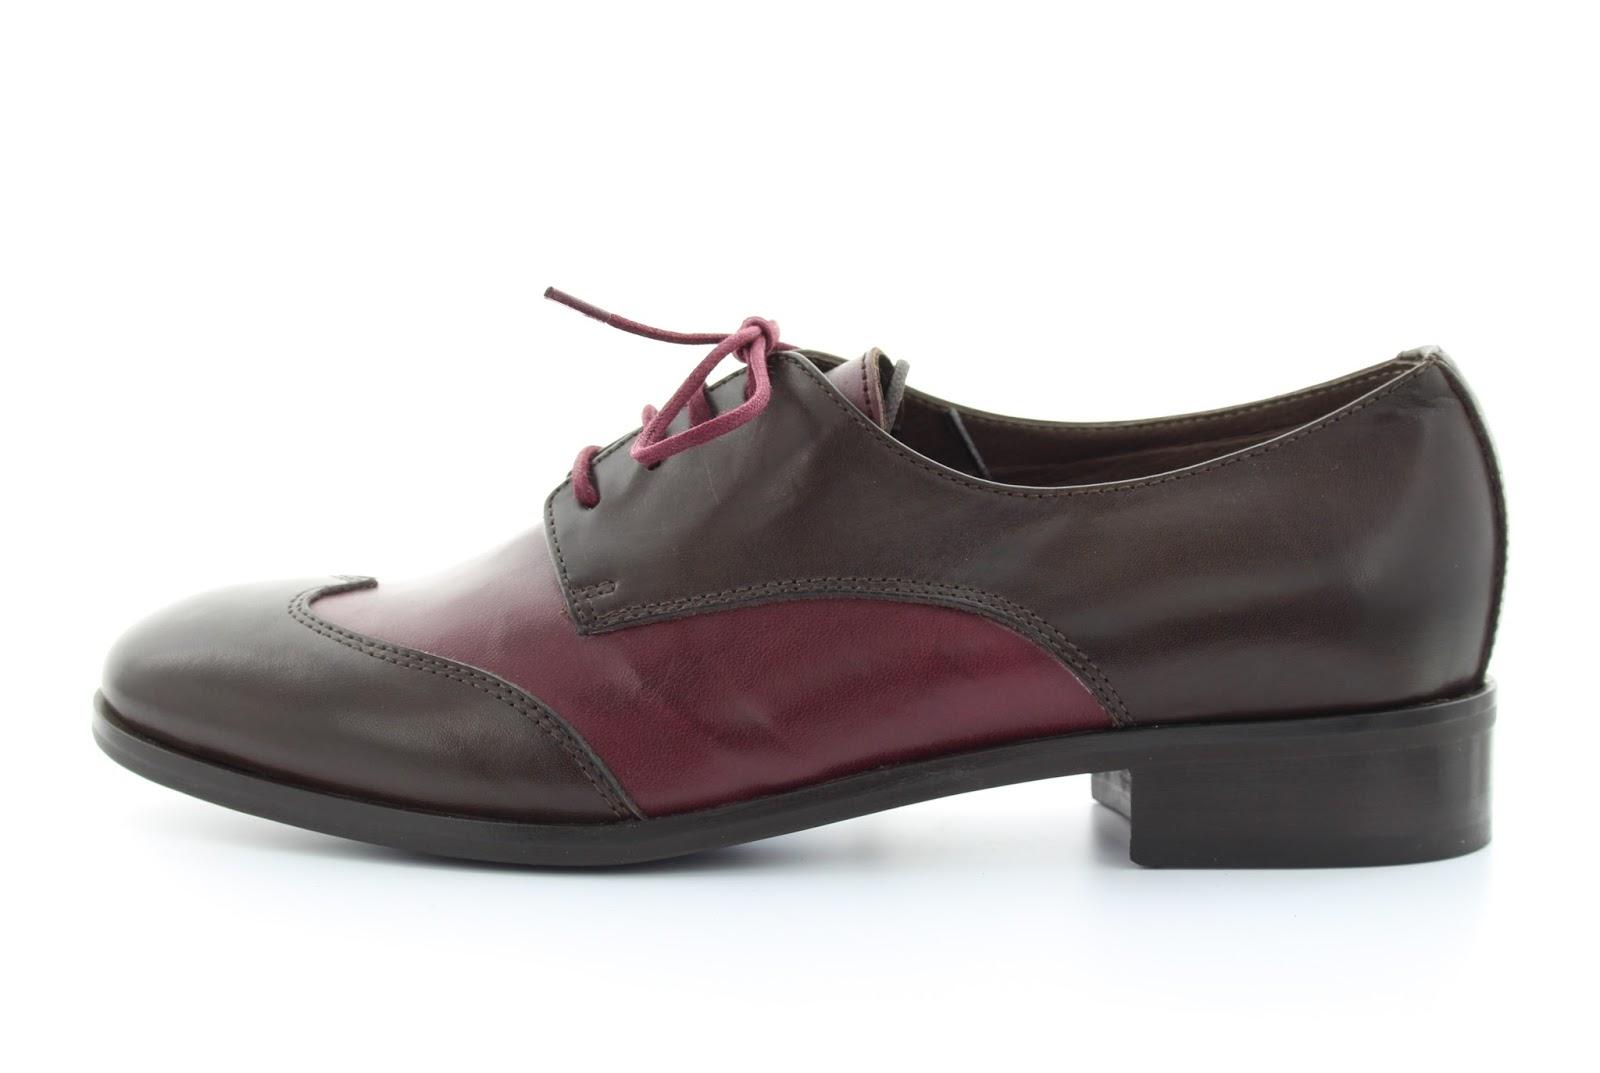 Chaussures Salamander Femme Collection Automne 2017 423dd161681